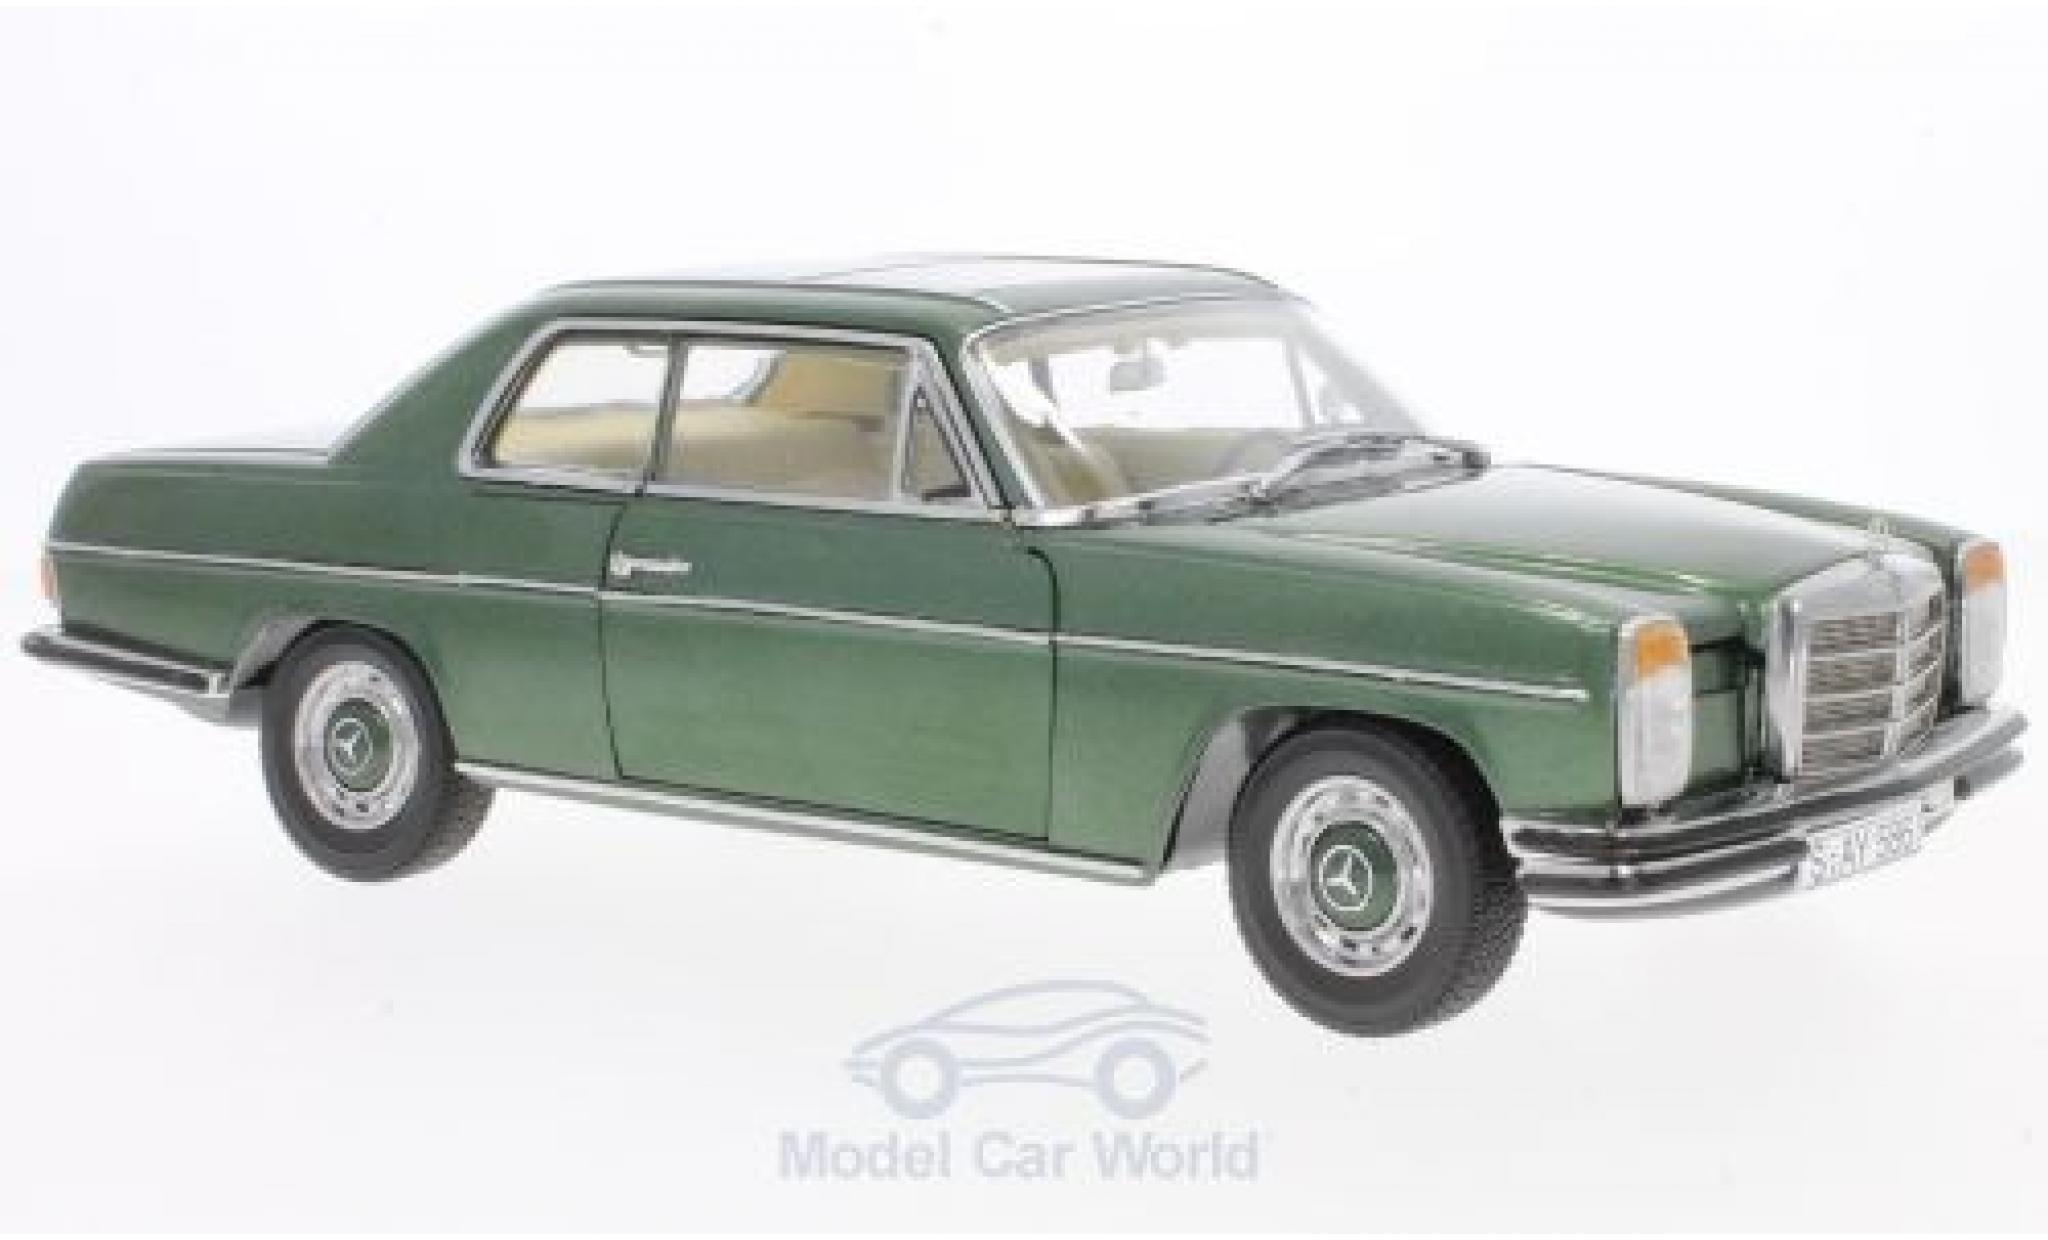 Mercedes 280 1/18 Sun Star C /8 (W 115) metallise green 1973